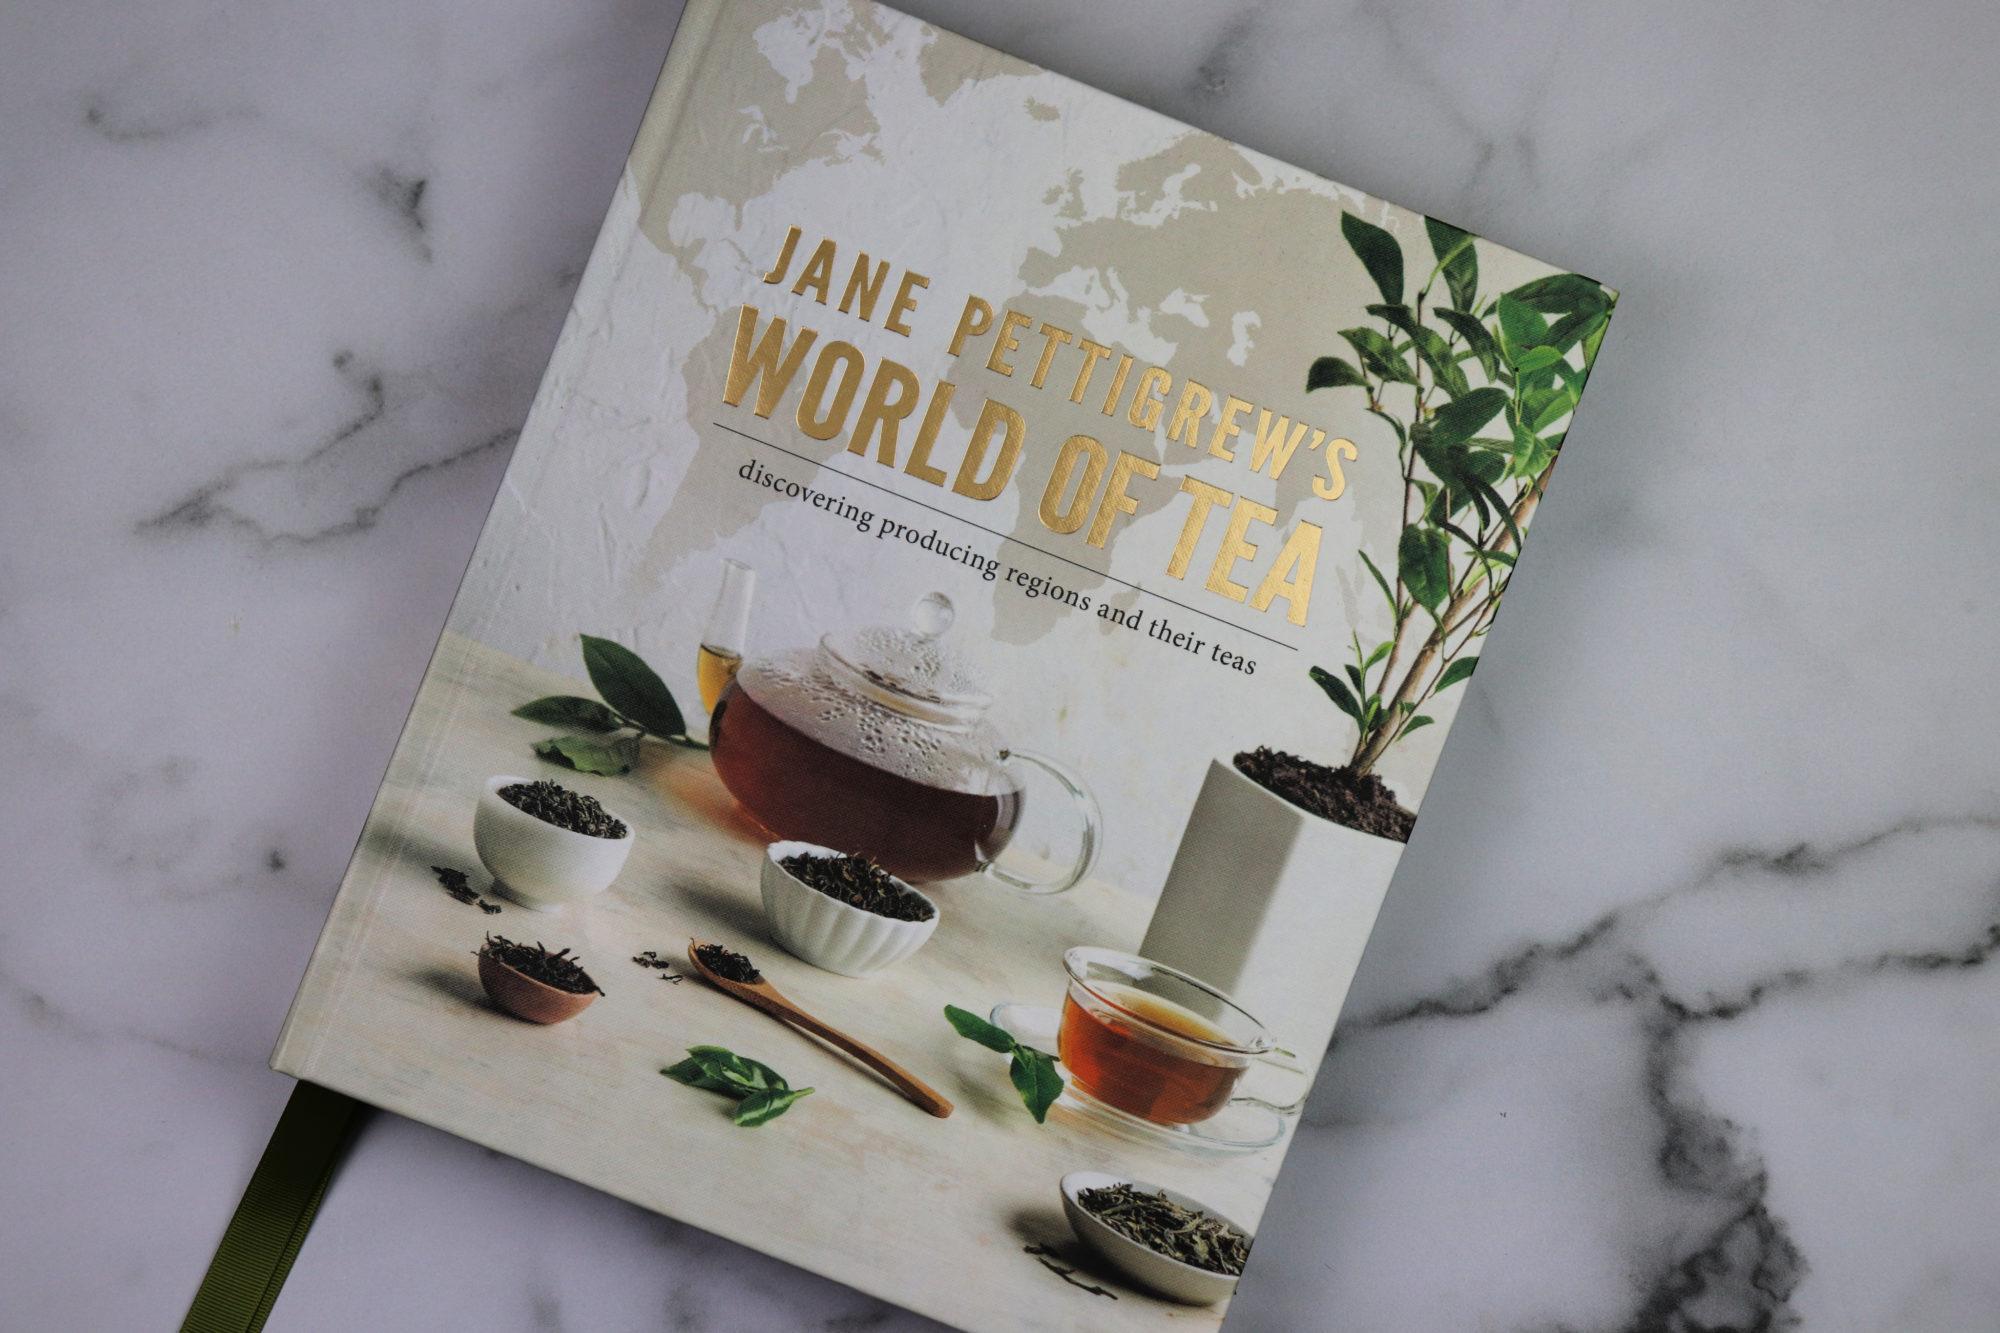 World of Tea by Jane Pettigrew